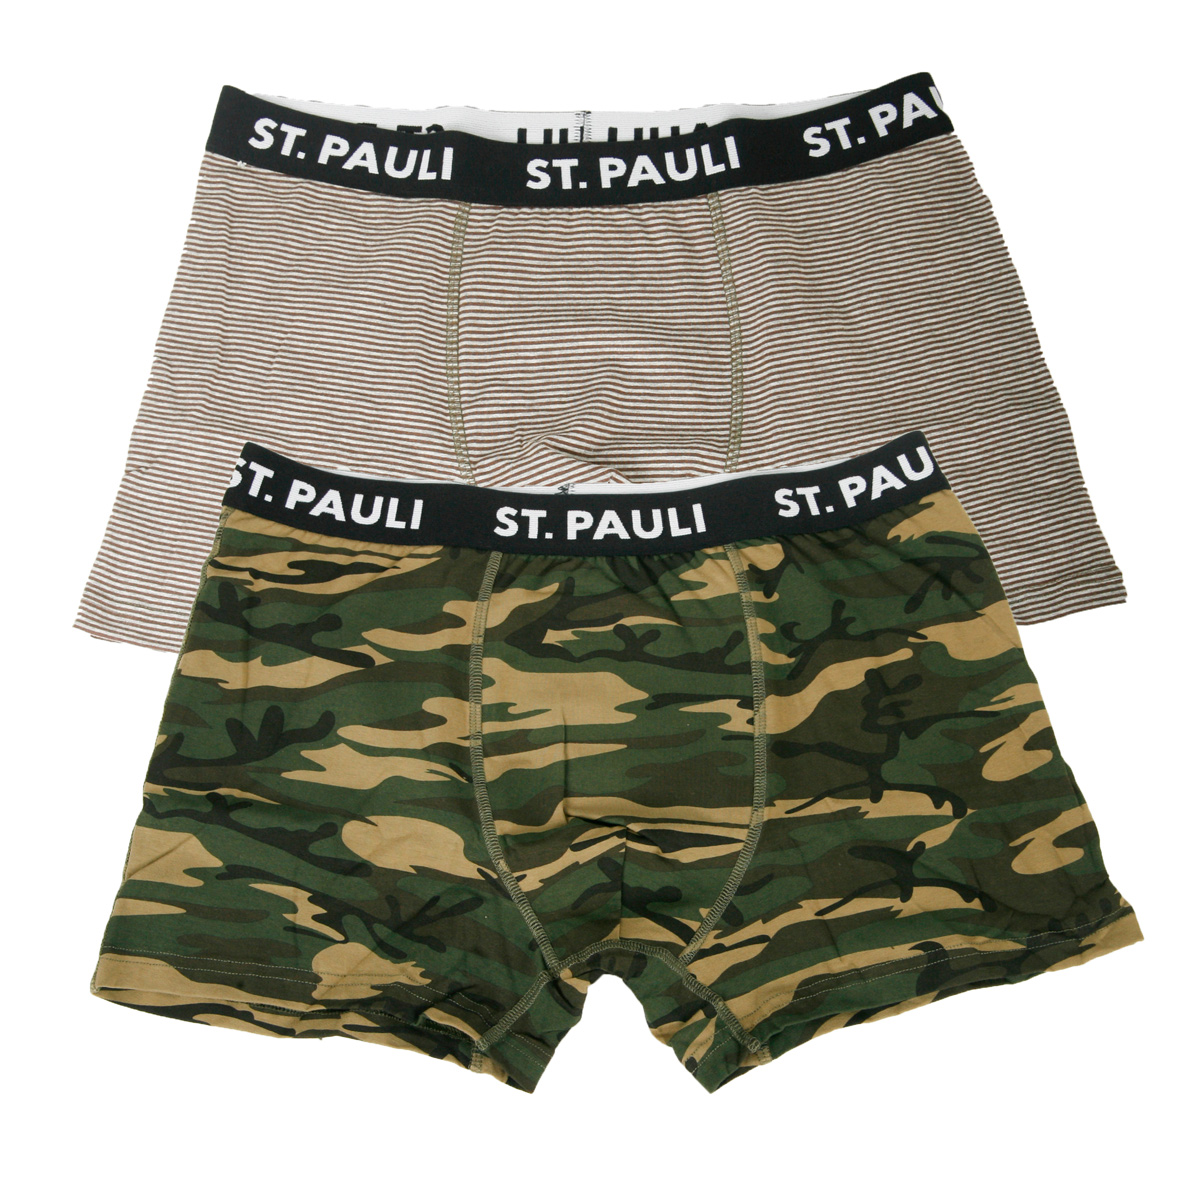 FC St. Pauli - Herren Boxershorts 2er Set - grau-camouflage